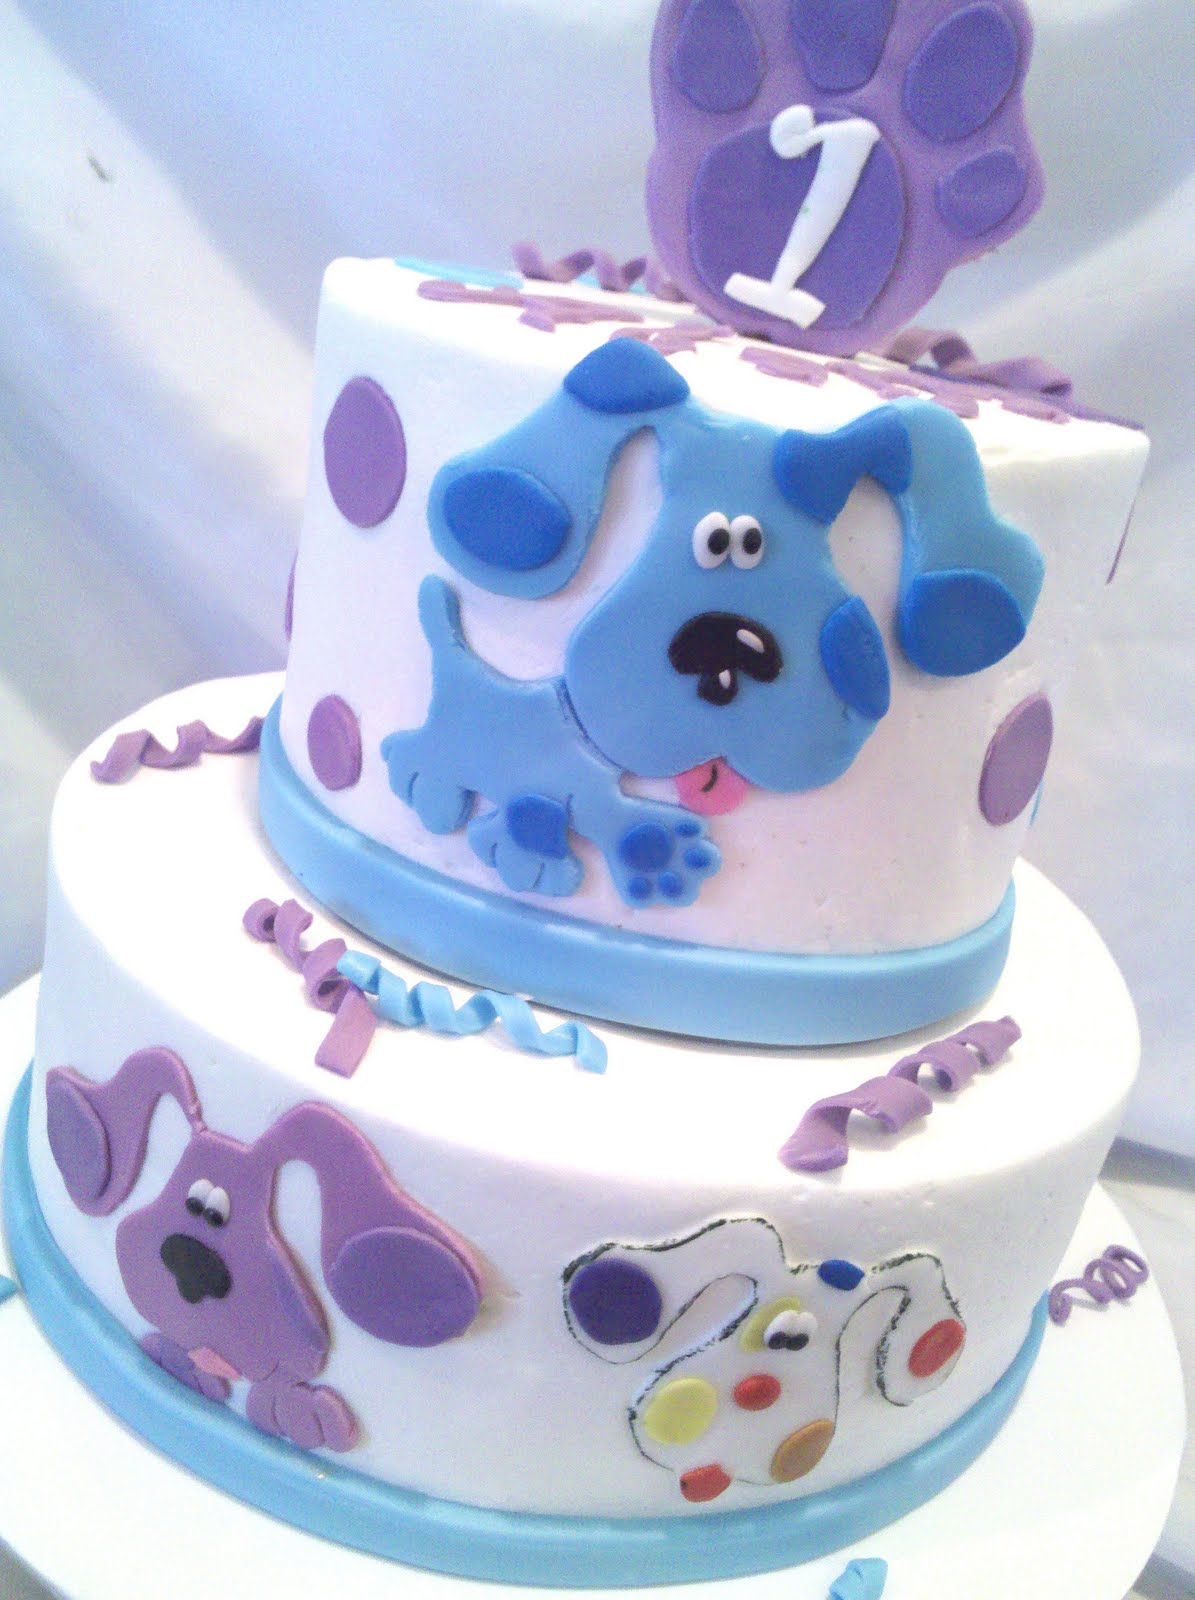 Blues Clues Birthday Party Cake